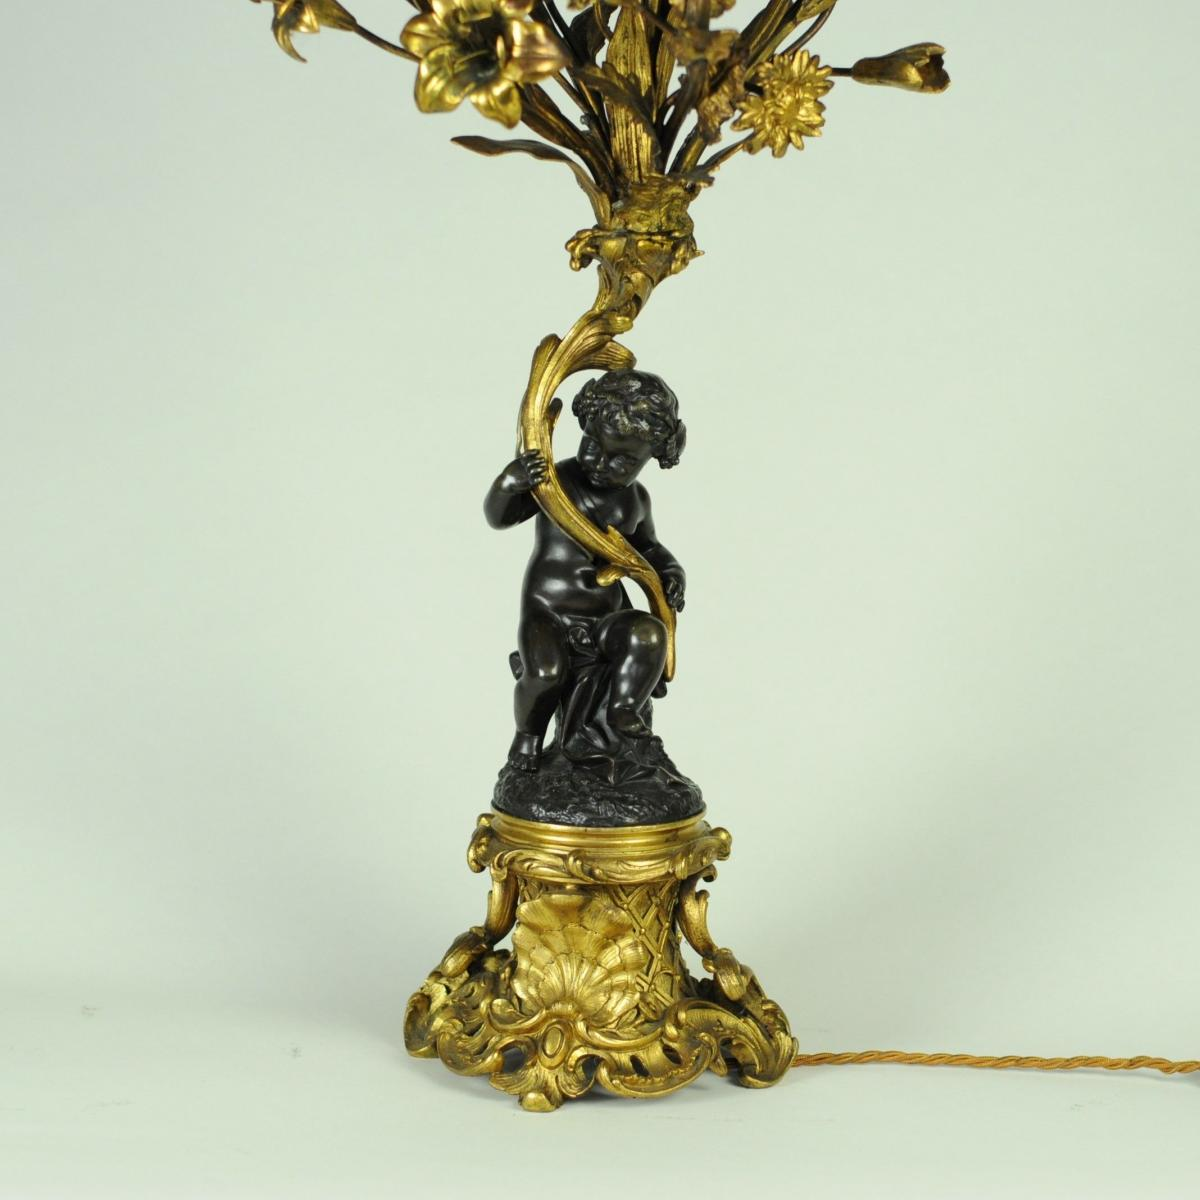 Pair of bronze and ormolu Cherub candelabra